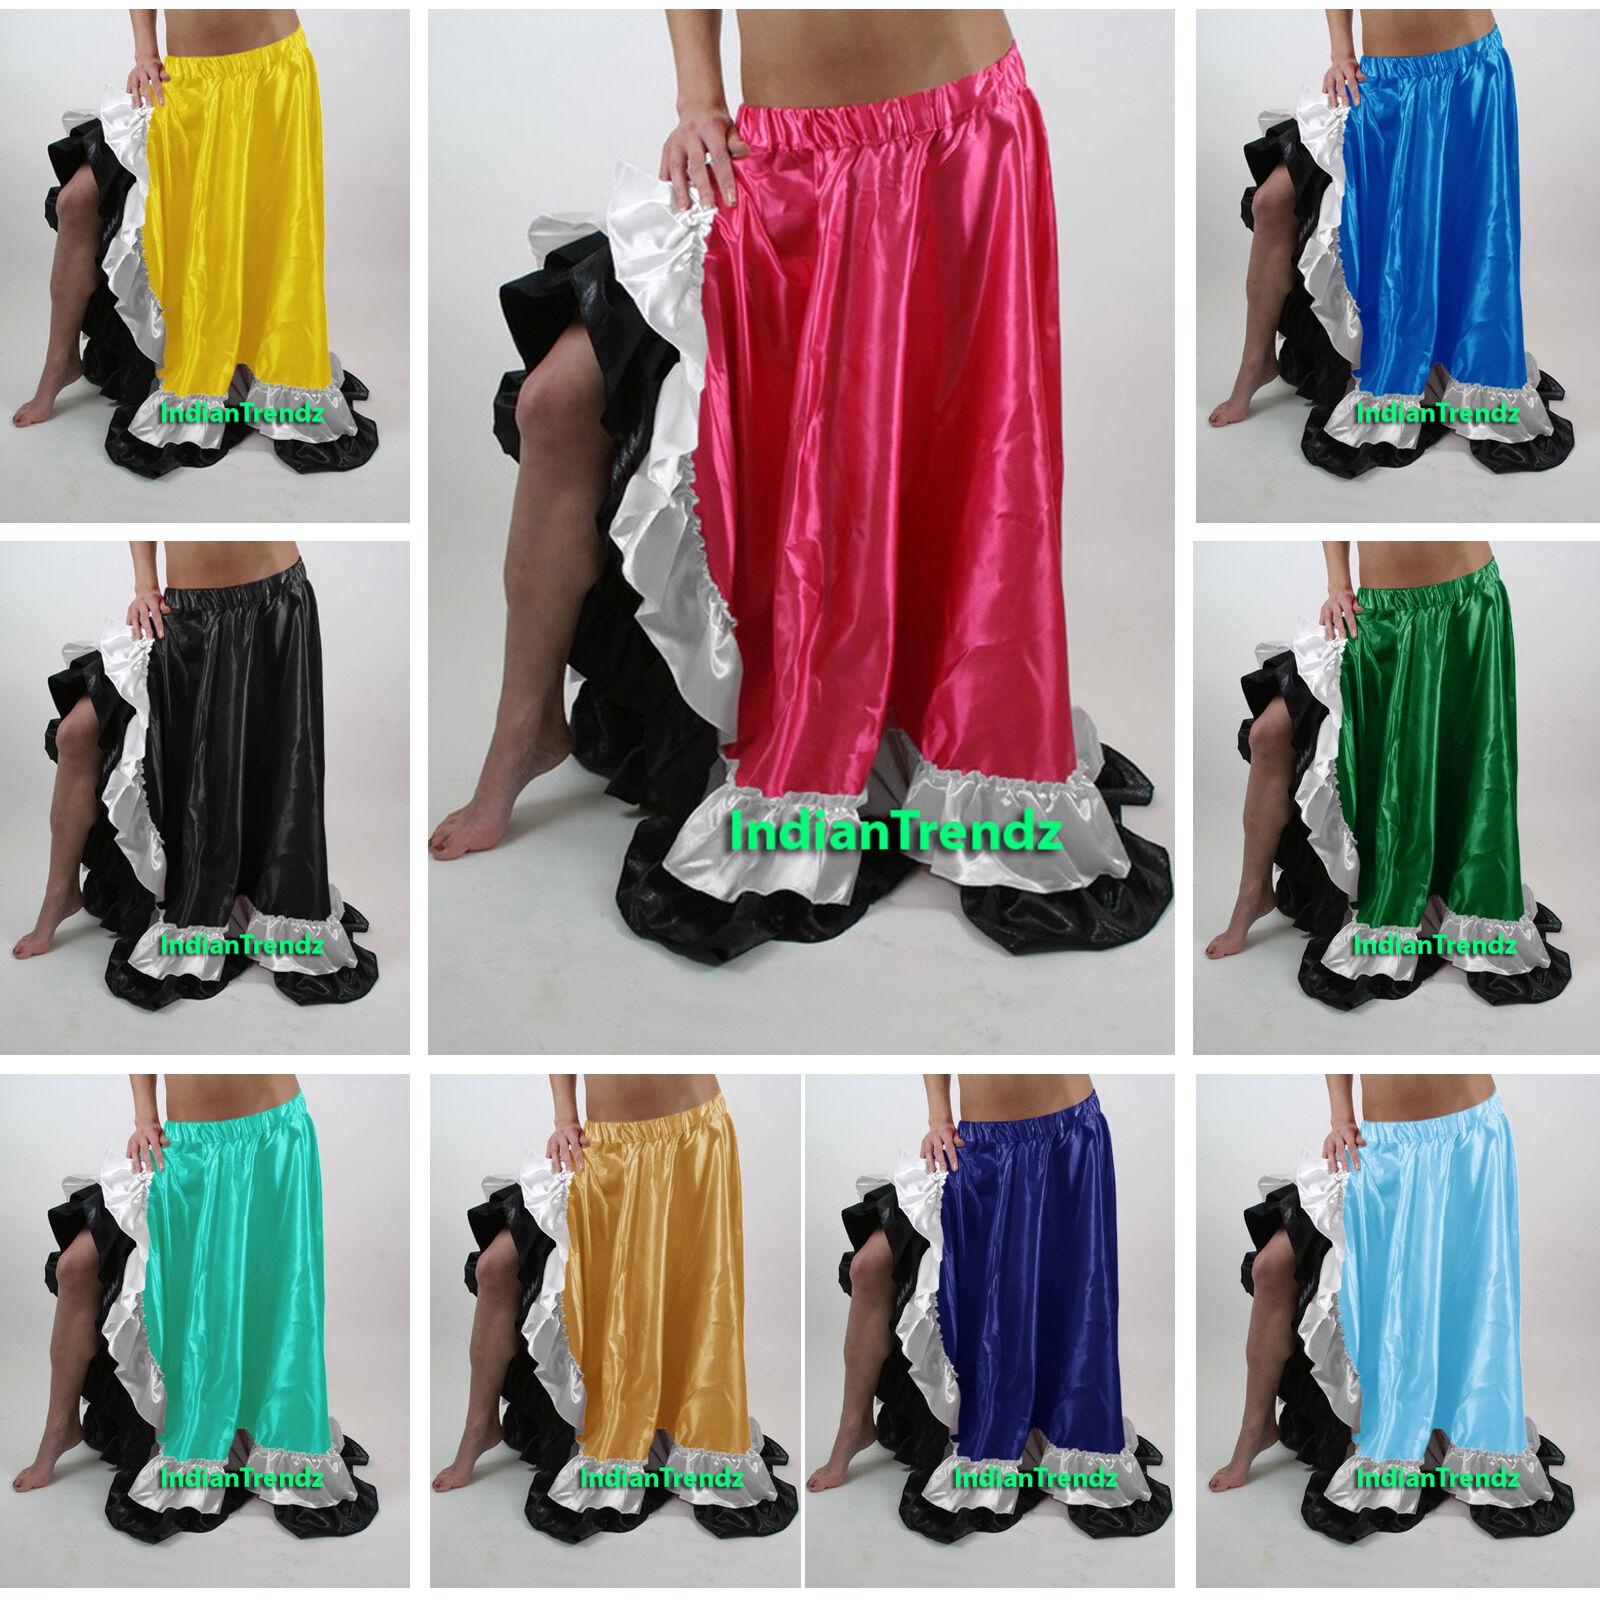 Satine Flamenco Fente Jupe Belly Dance Gitan Danse ventre du ventre Danse Danse Orientale 772a47